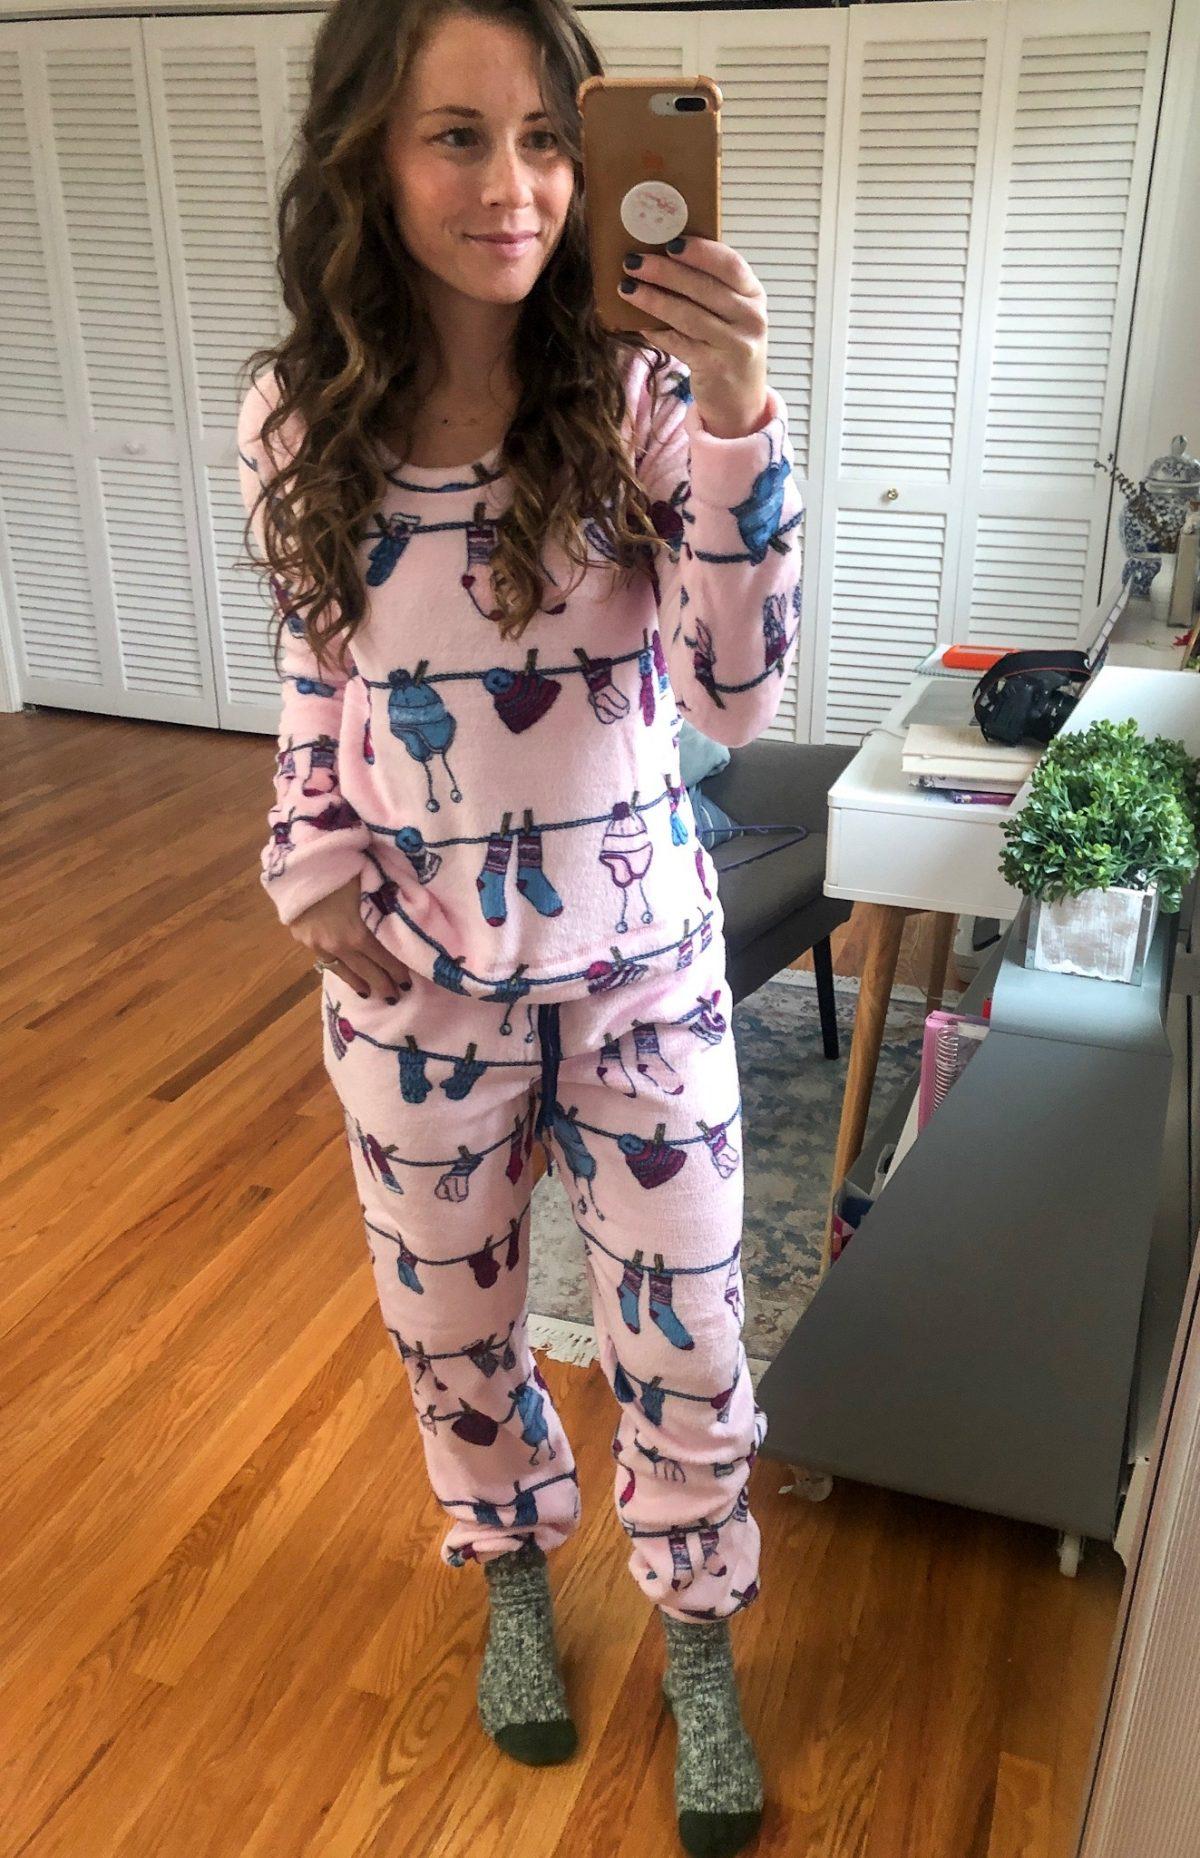 Mae Christmas Pajamas - winter pajamas - fleece pullover and joggers in winter cozy pattern